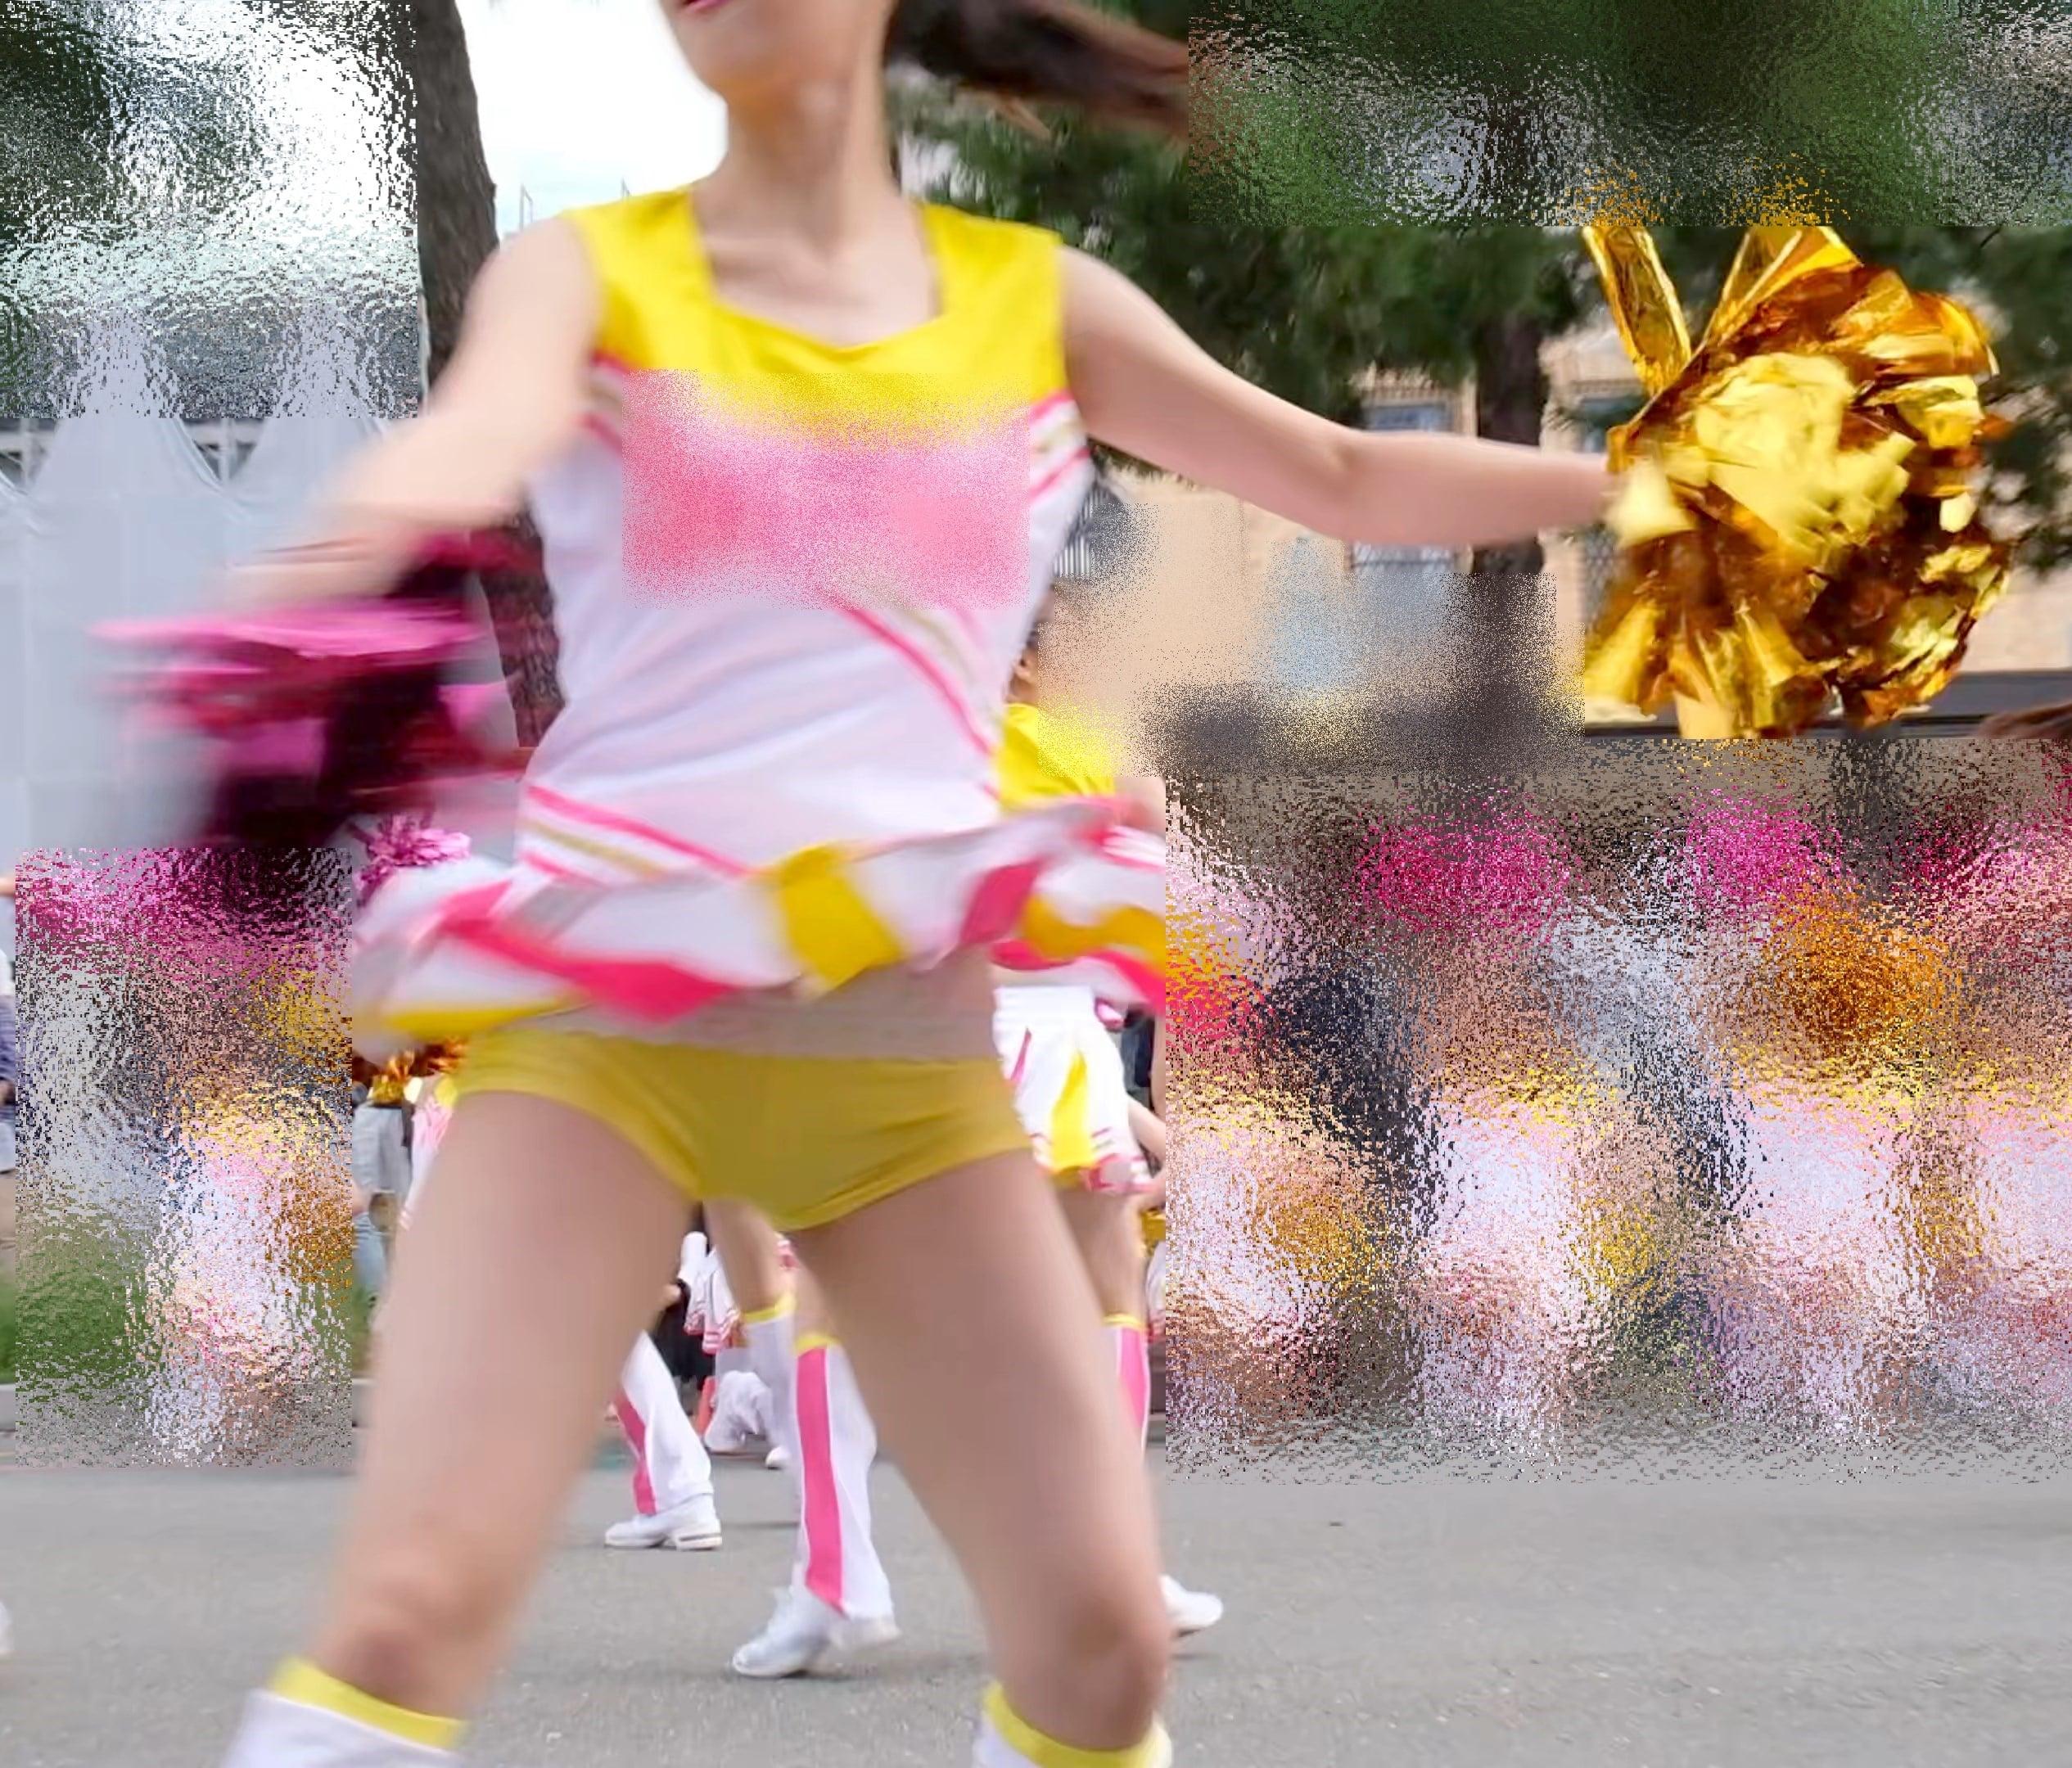 【4Kチア】☆☆アイドルより可愛い!!JDチアダンス!4☆Part2☆画像つき詳細レビュー